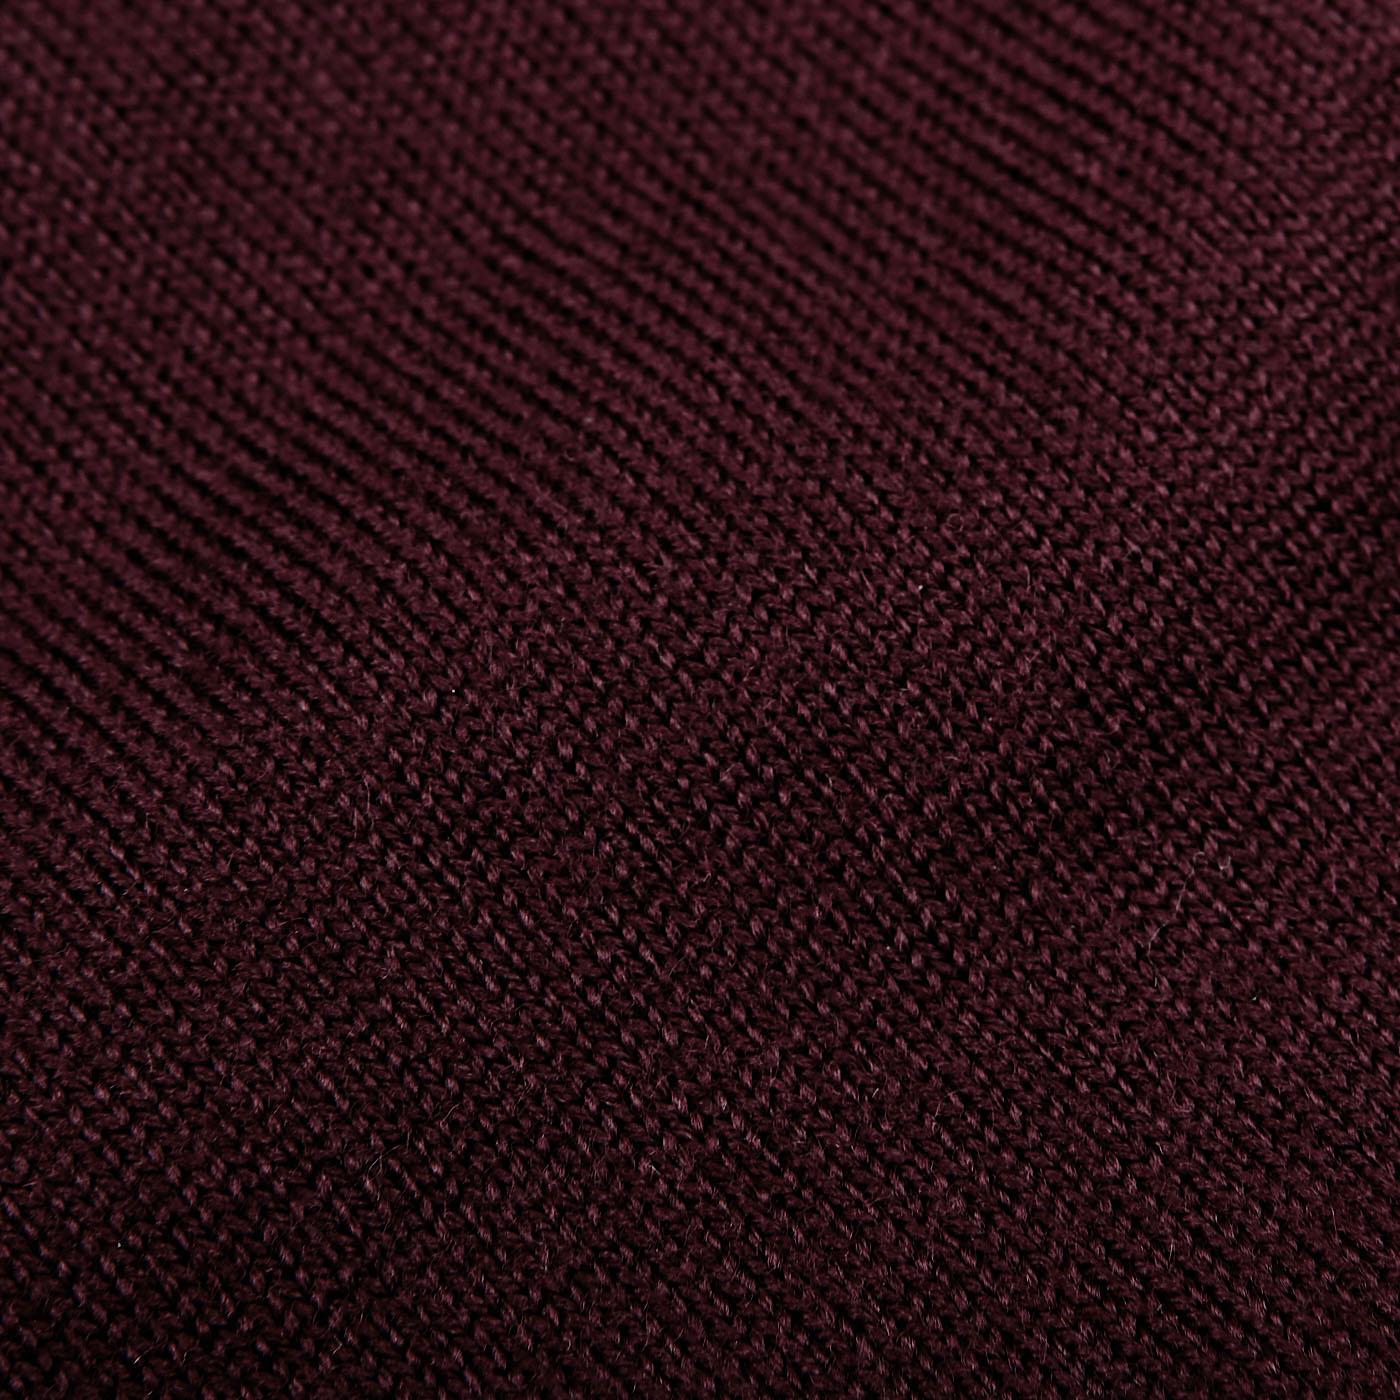 Gran Sasso Burgundy Extra Fine Merino Crew Neck Fabric